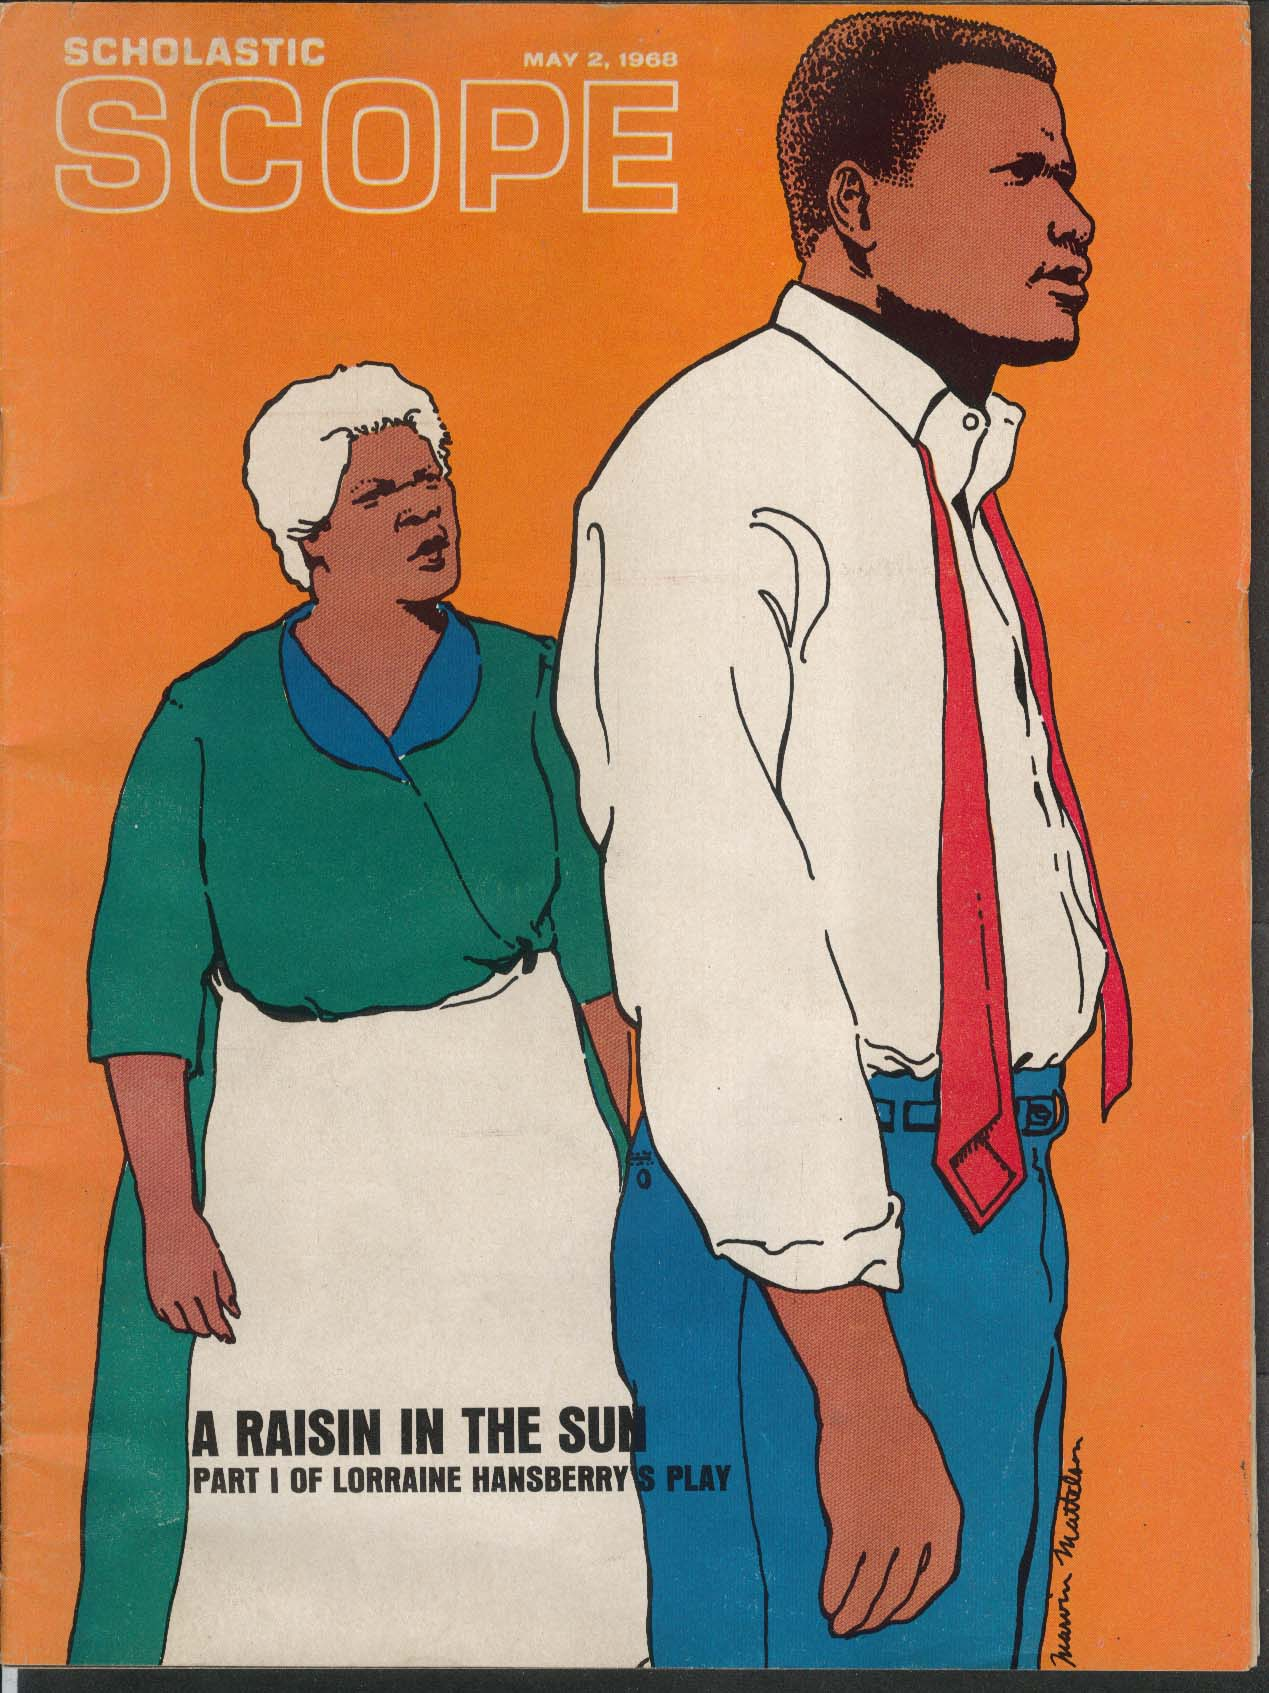 Scholastic Scope Raisin In The Sun Lorraine Hansberry 5 2